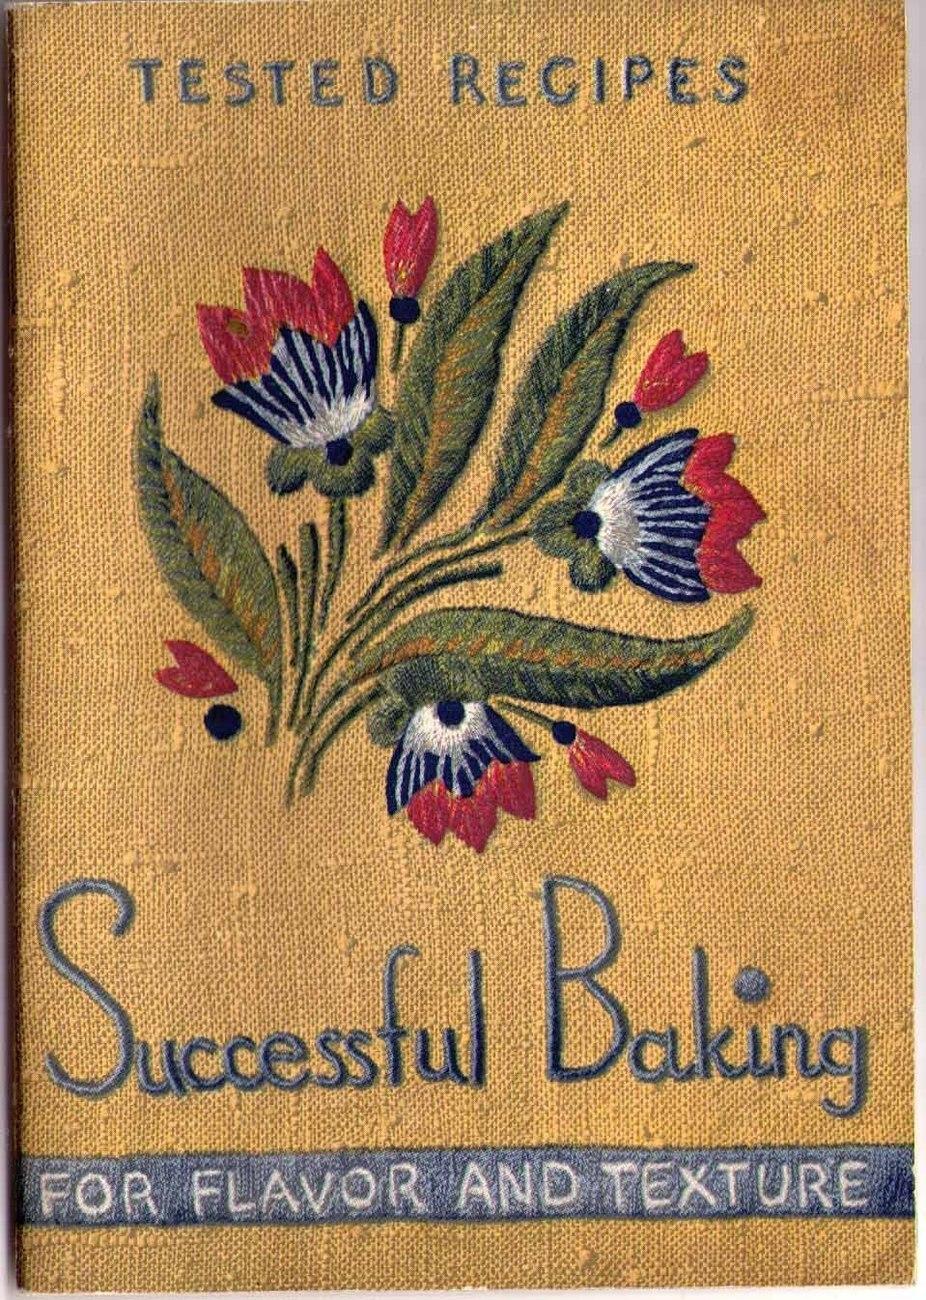 Successfulbaking bakingsoda 1